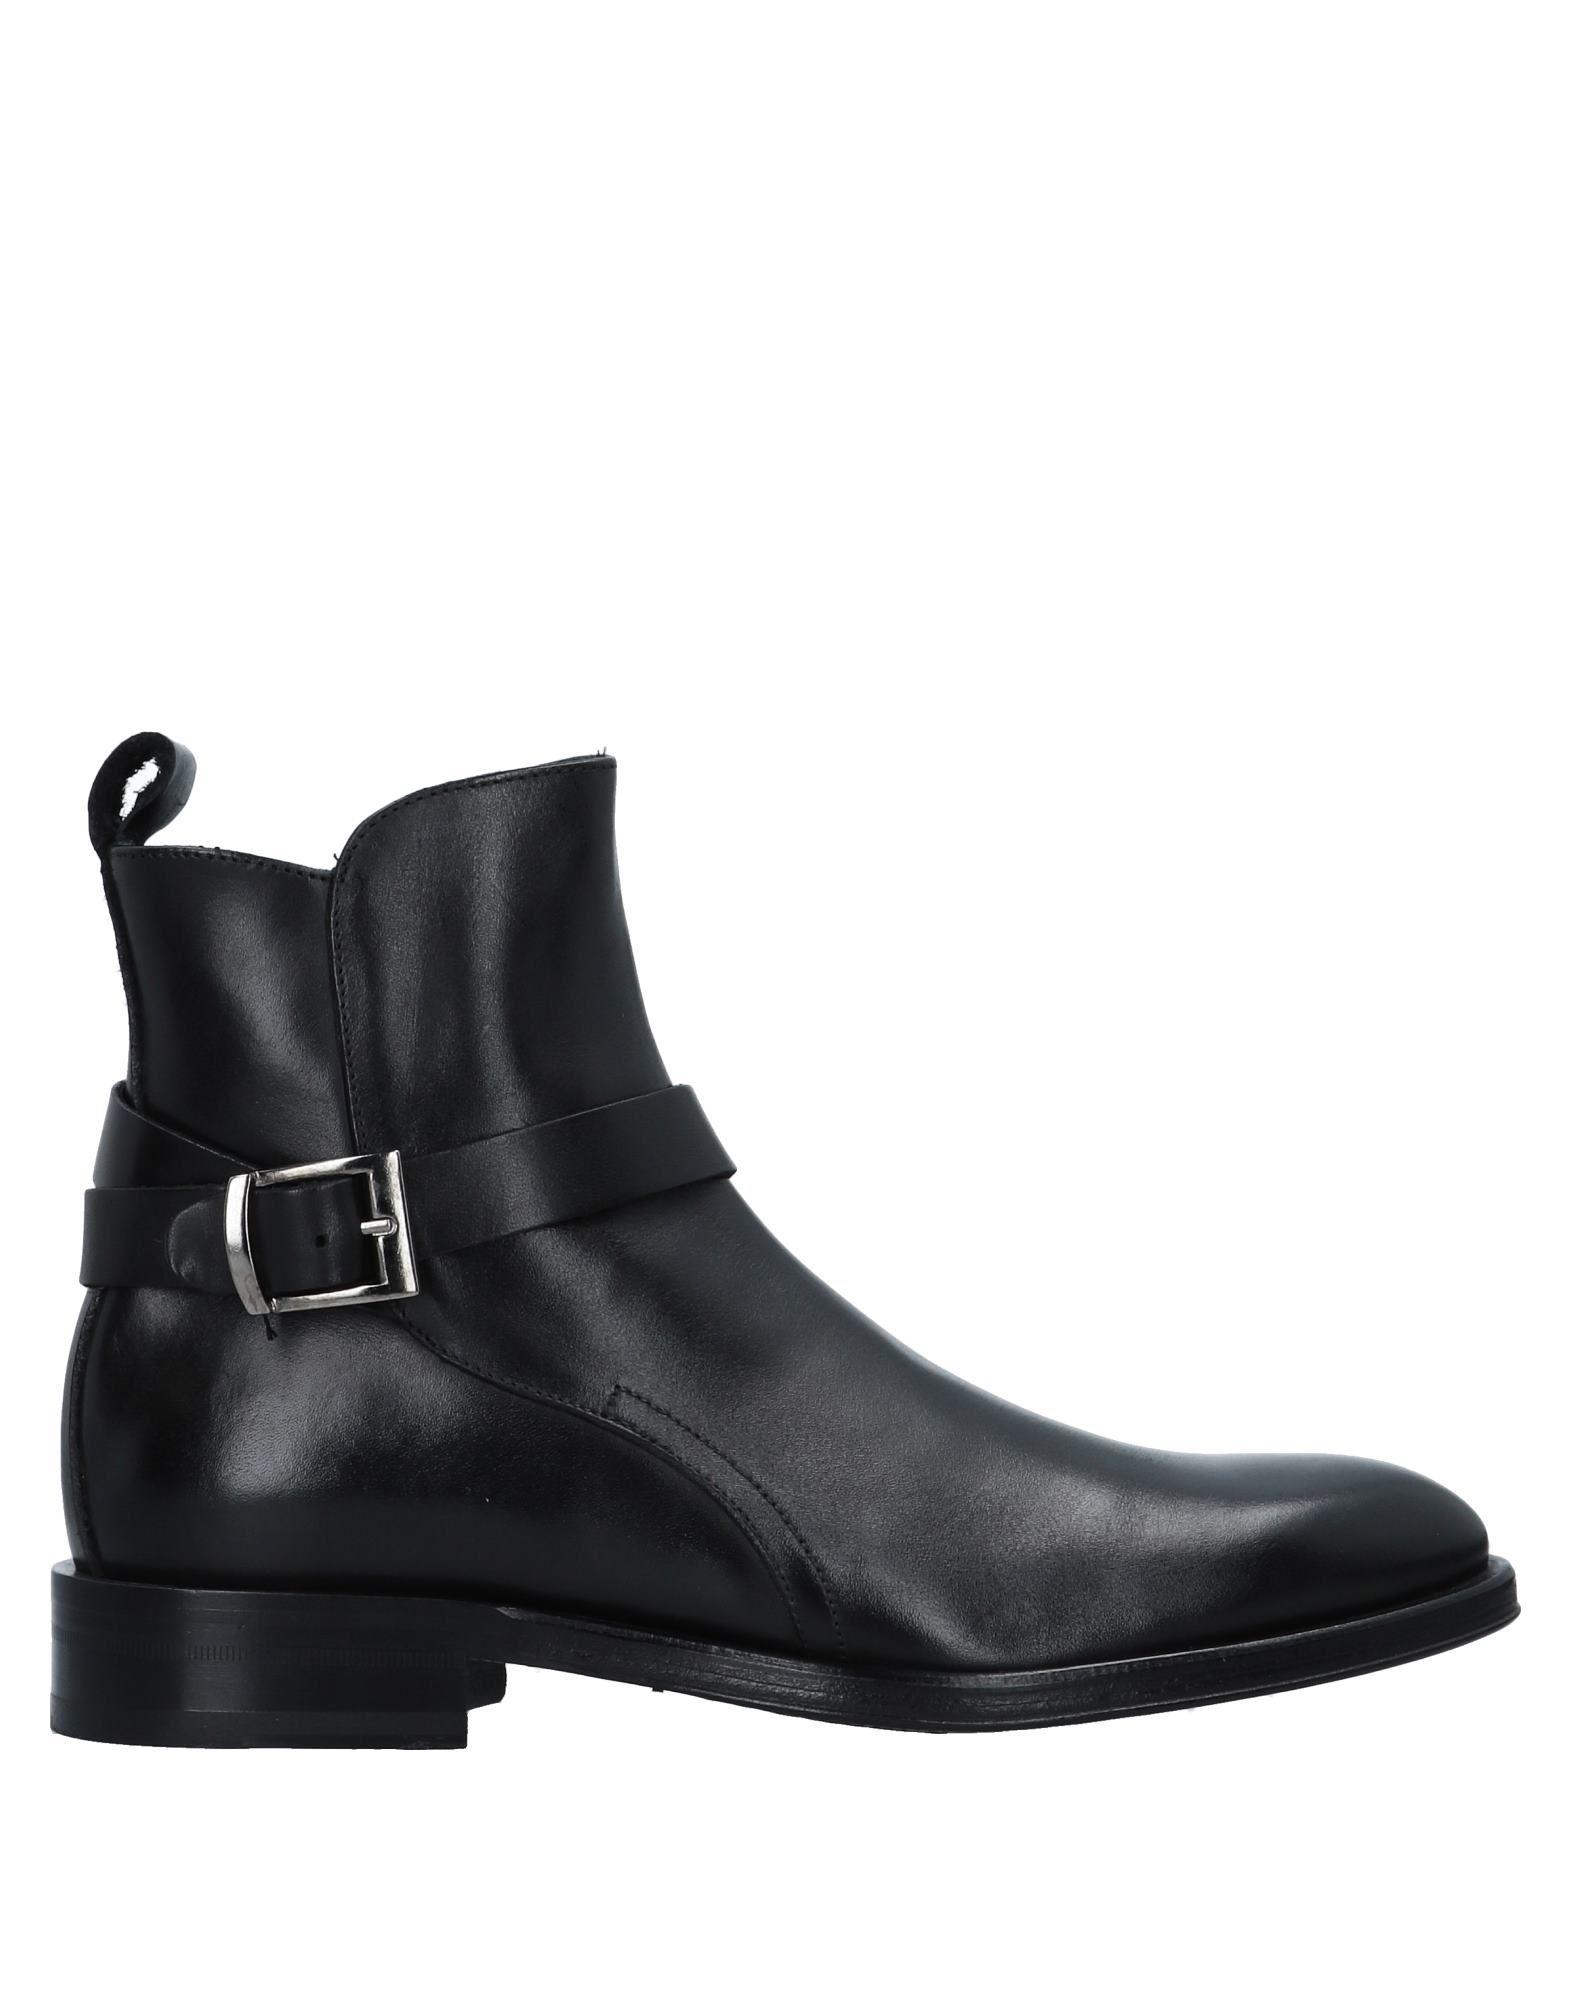 Rabatt echte Schuhe Savio Barbato 11536885QU Stiefelette Herren  11536885QU Barbato 4bf483